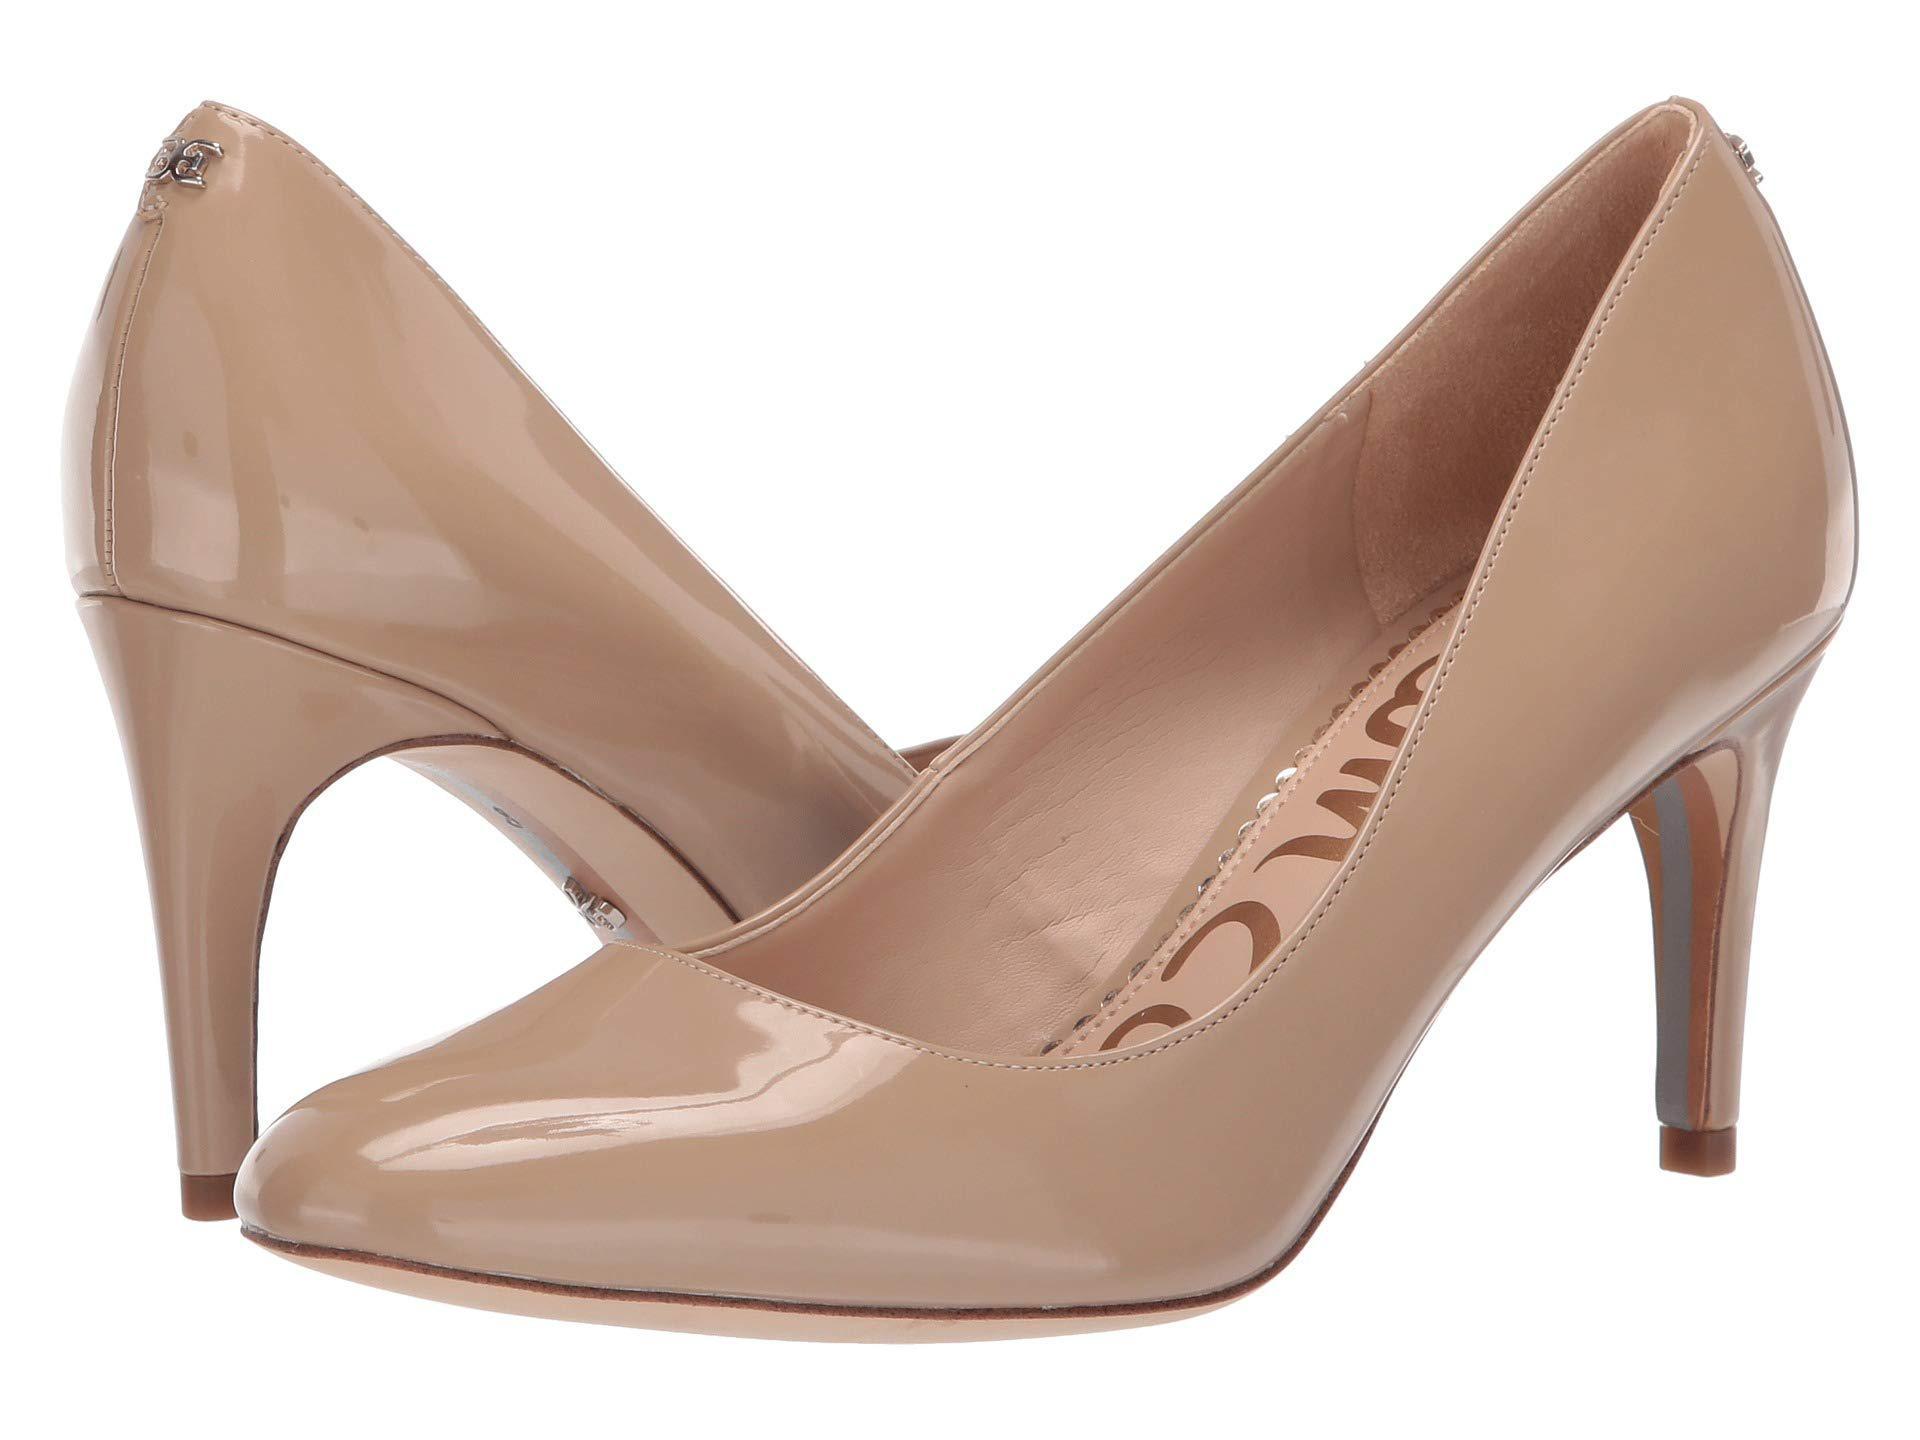 c30dca8141f1e0 Lyst - Sam Edelman Elise (black Patent) Women s Shoes in Natural